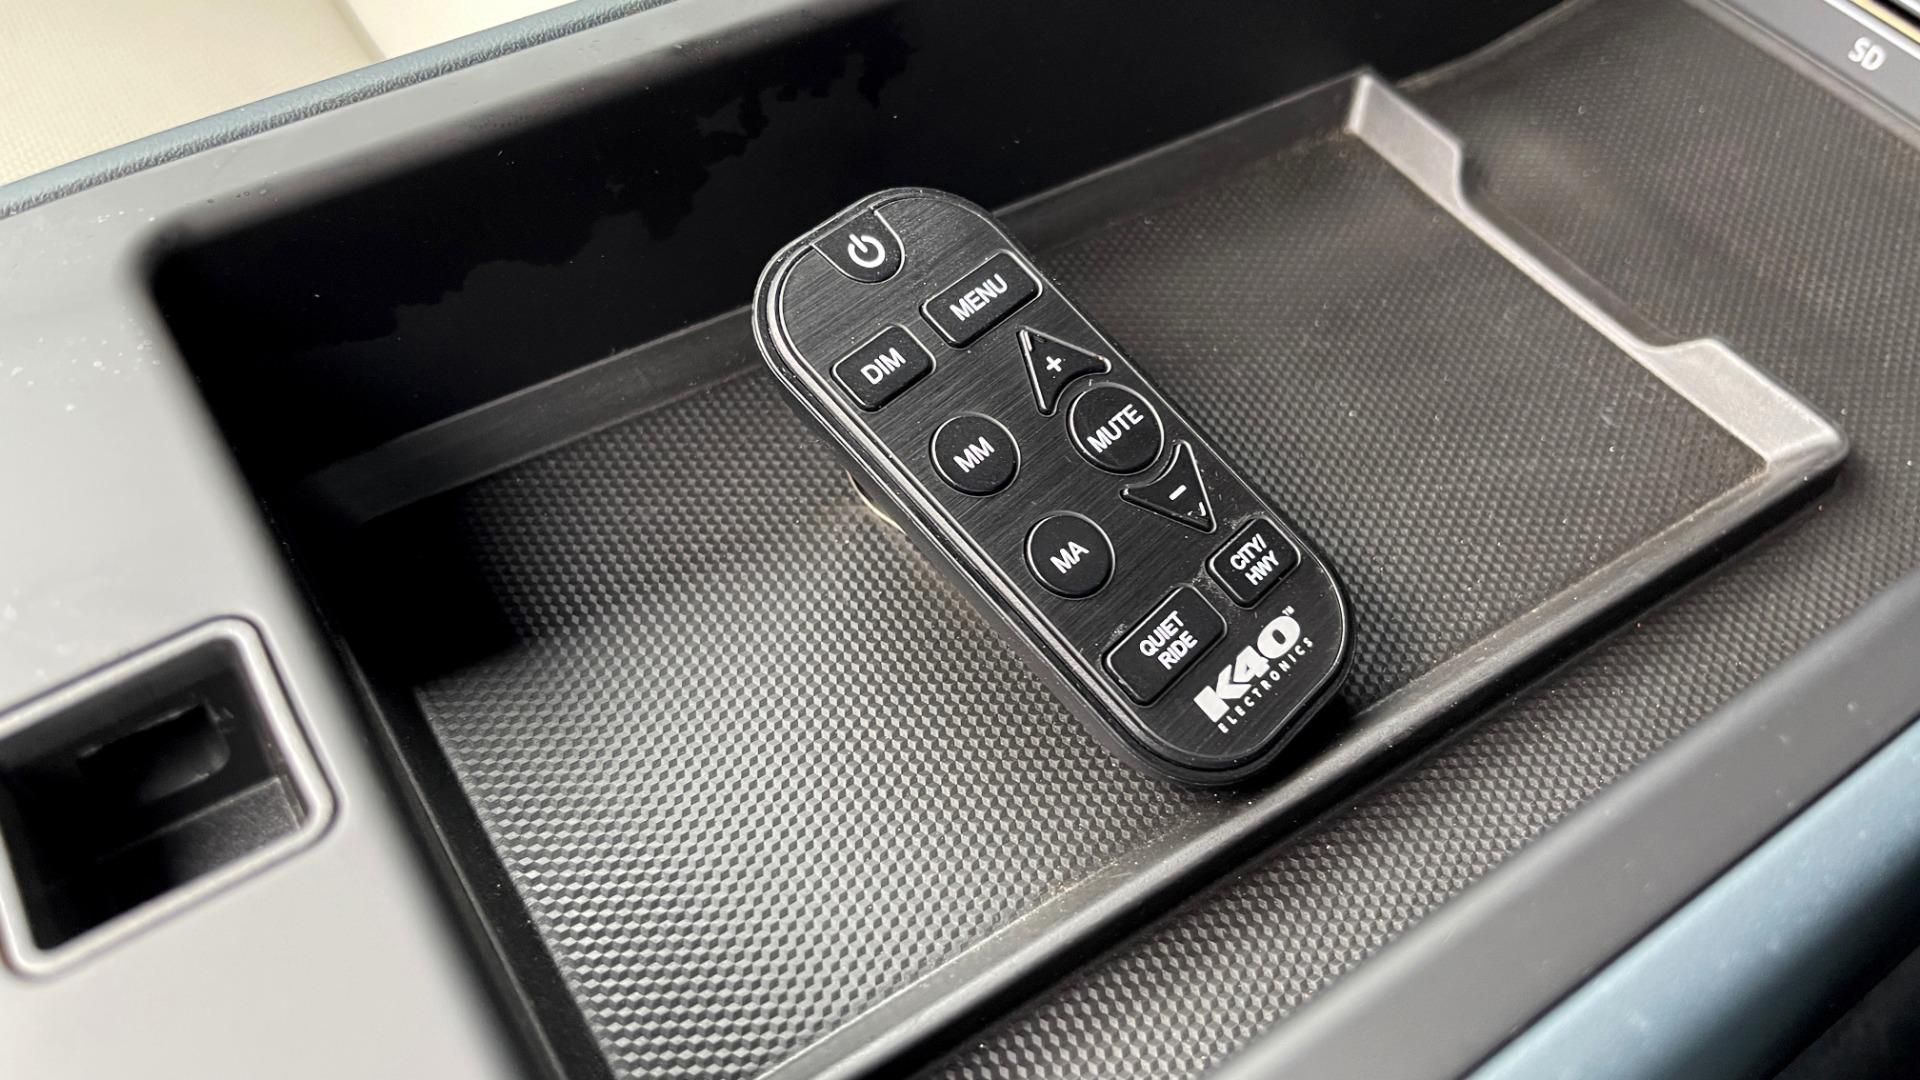 Used 2020 Porsche 911 CARRERA 4S CABRIOLET PREMIUM SPORT PKG / NAV / BOSE / LIGHT DESIGN PKG for sale $167,595 at Formula Imports in Charlotte NC 28227 66